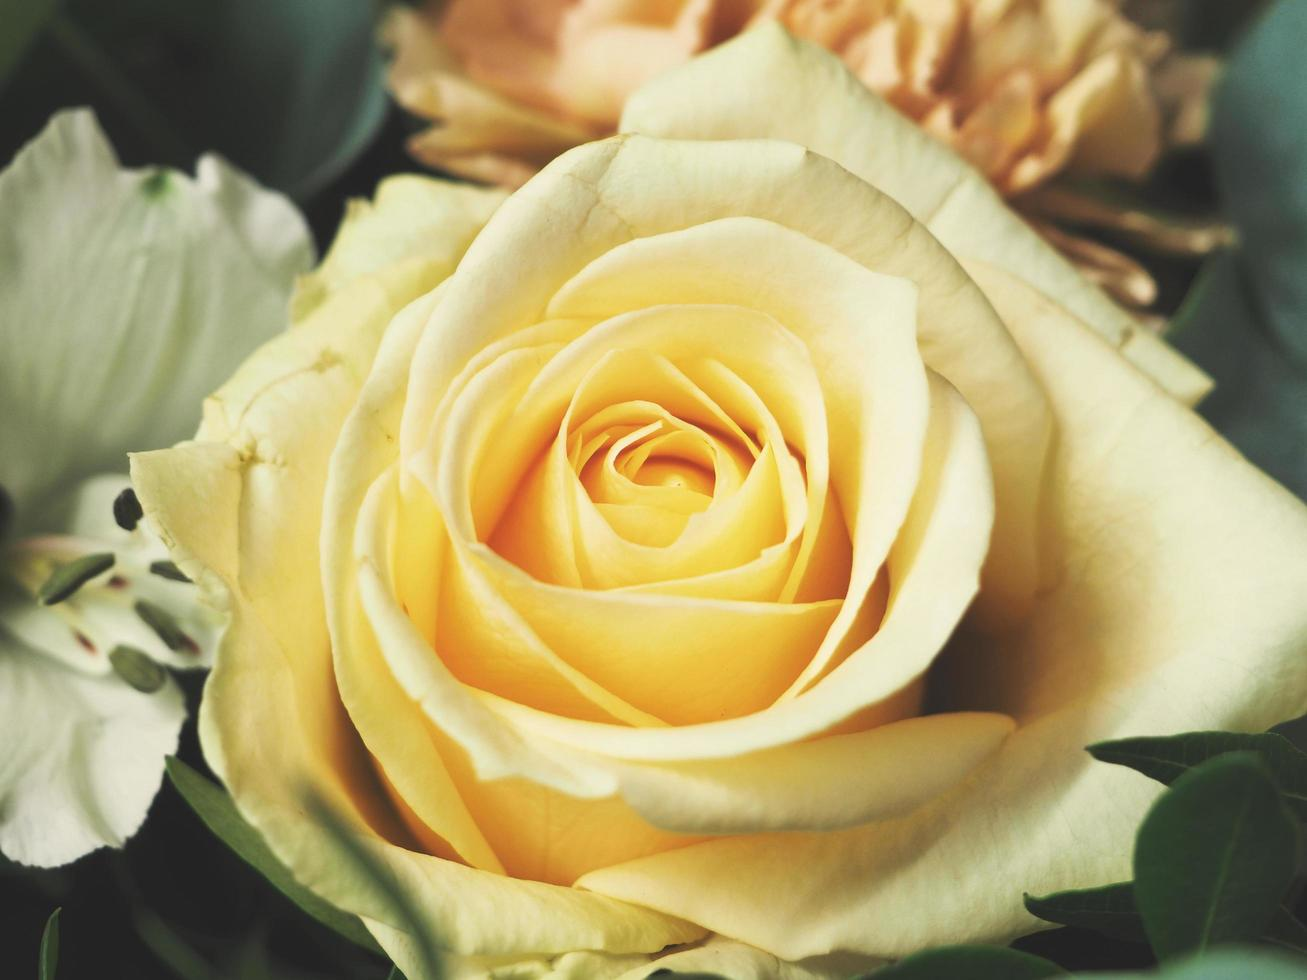 Close-up of yellow rose photo